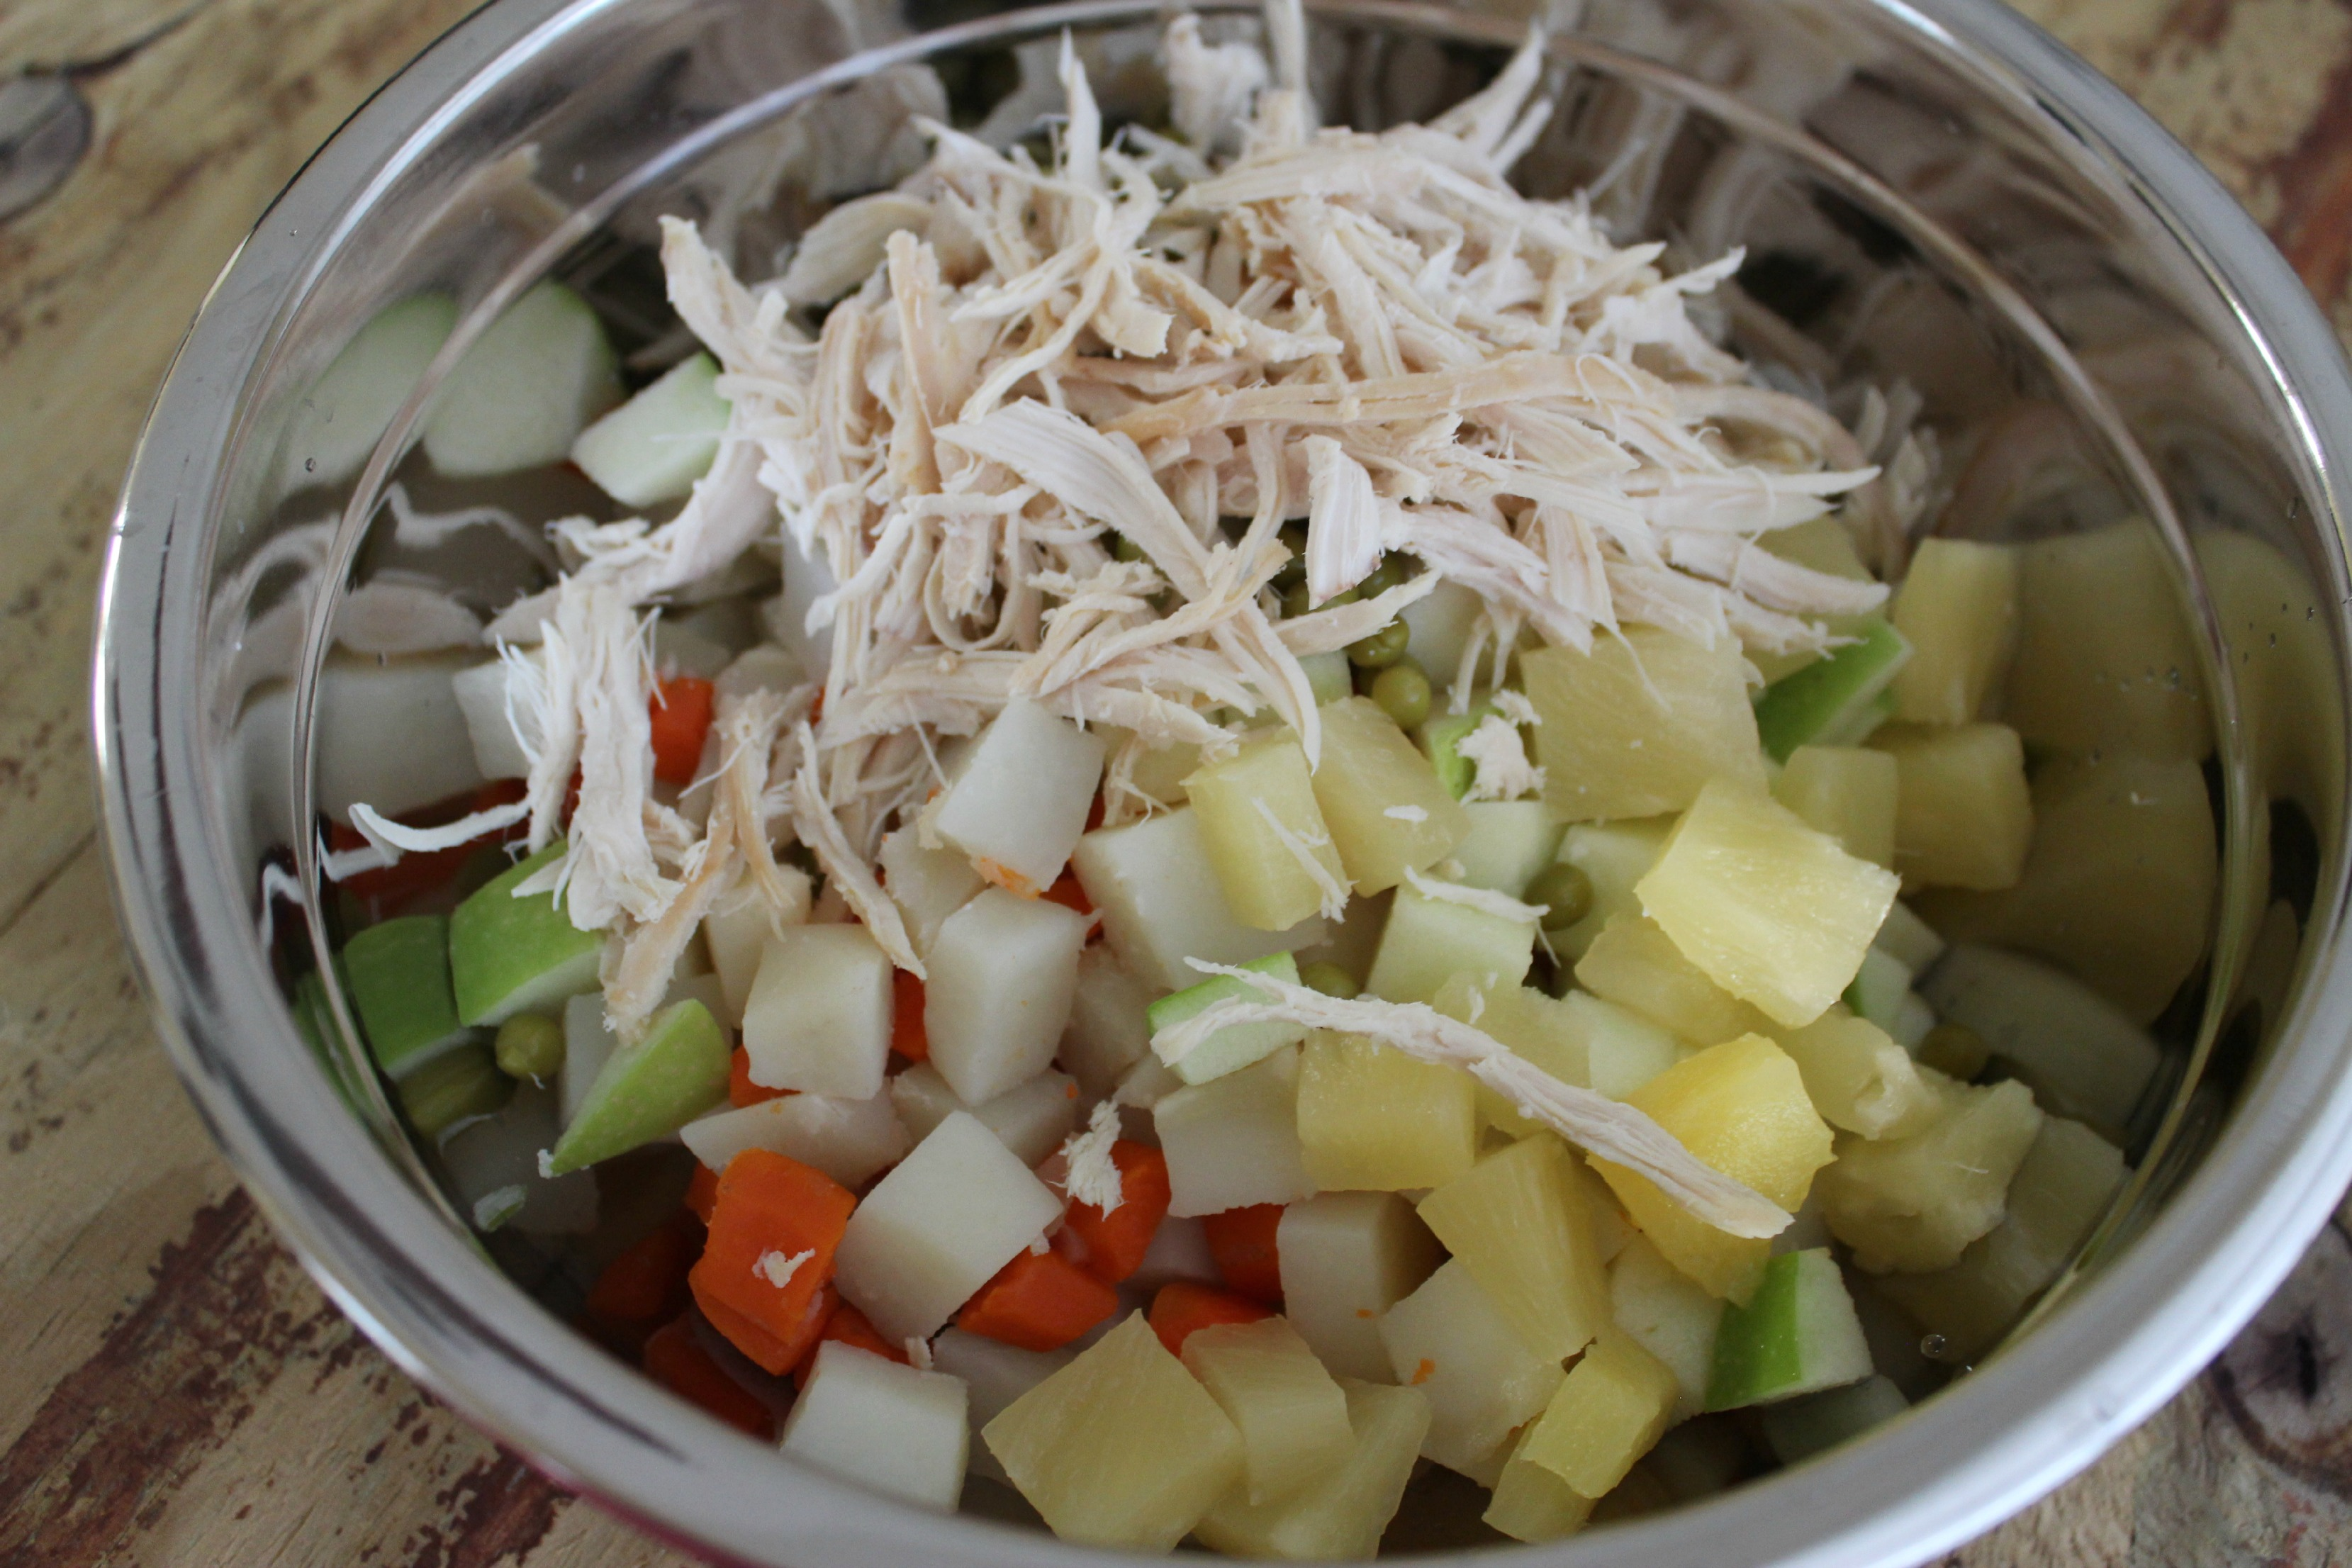 Ensalada de gallina navide a venezolana for Ingredientes para cocinar